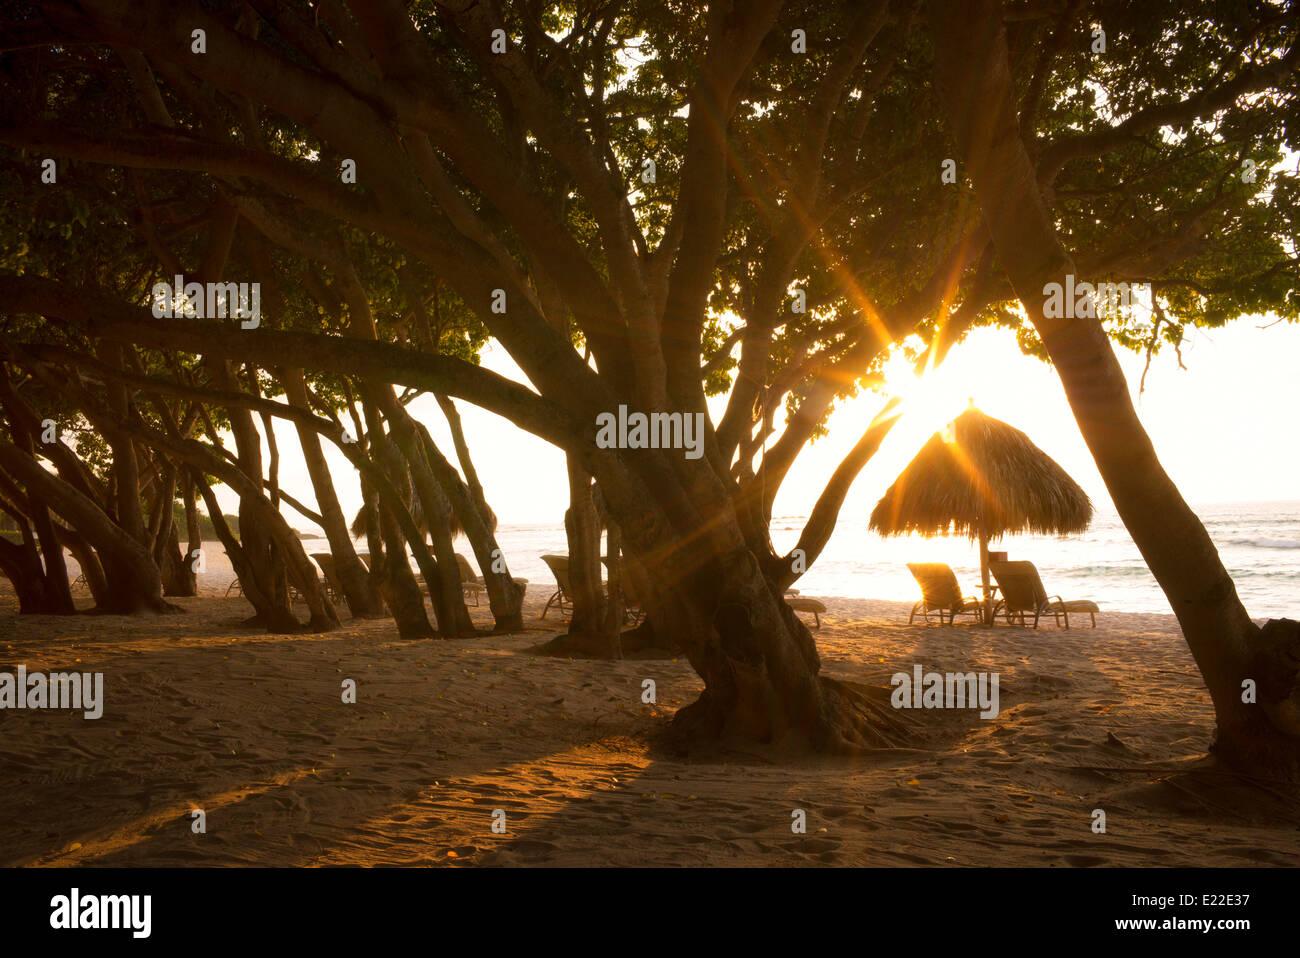 Sunburst through trees with beach chairs and umbrellas on beach. Punta Mita, Mexico - Stock Image